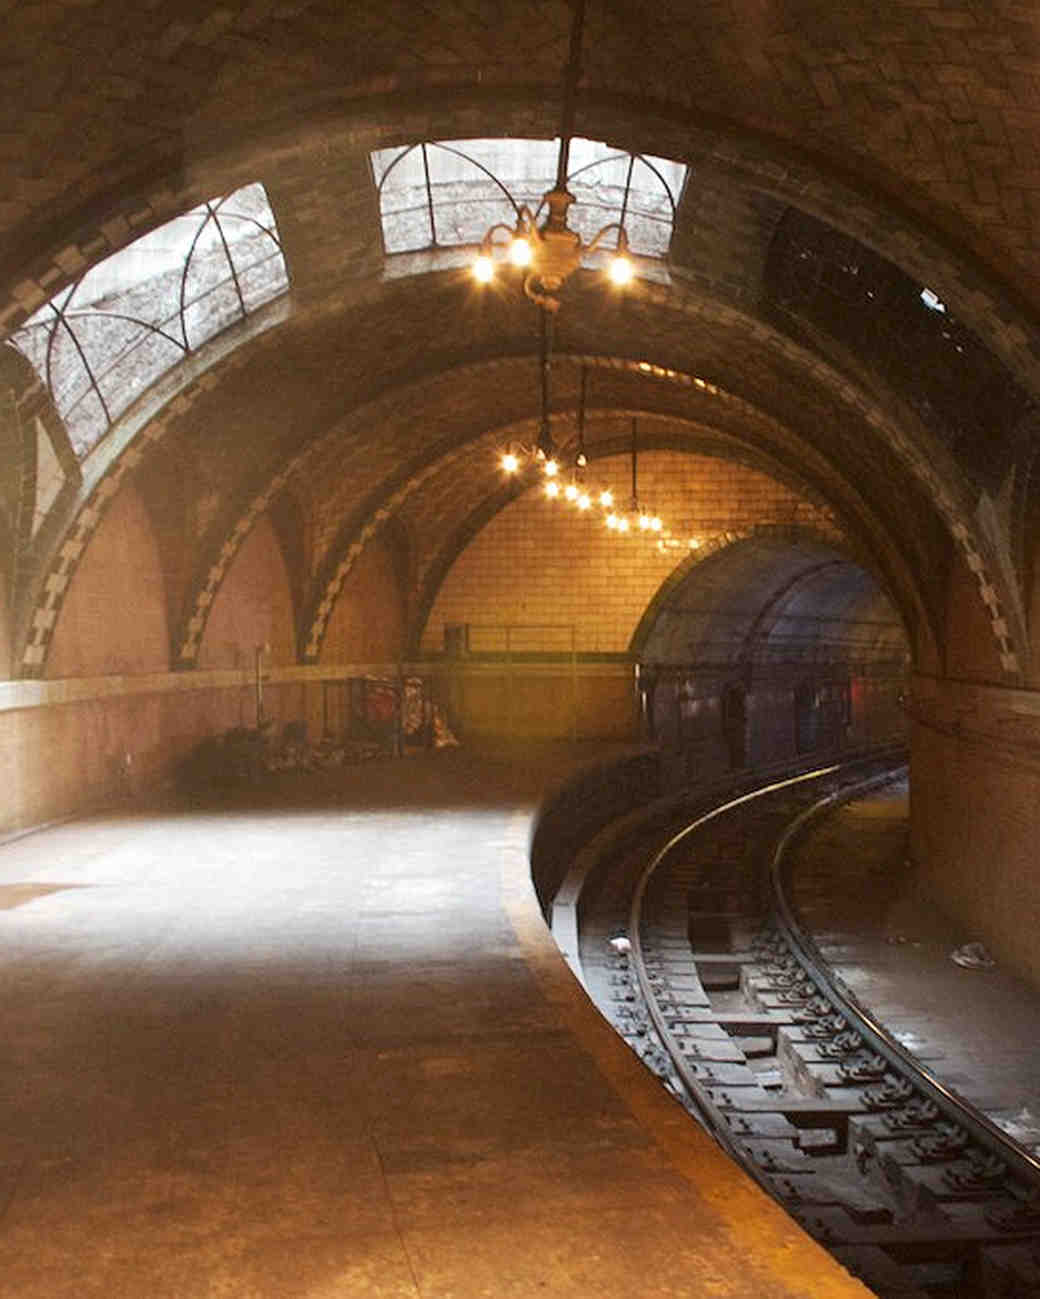 nyc-proposal-spots-abandoned-city-hall-subway-0316.jpg